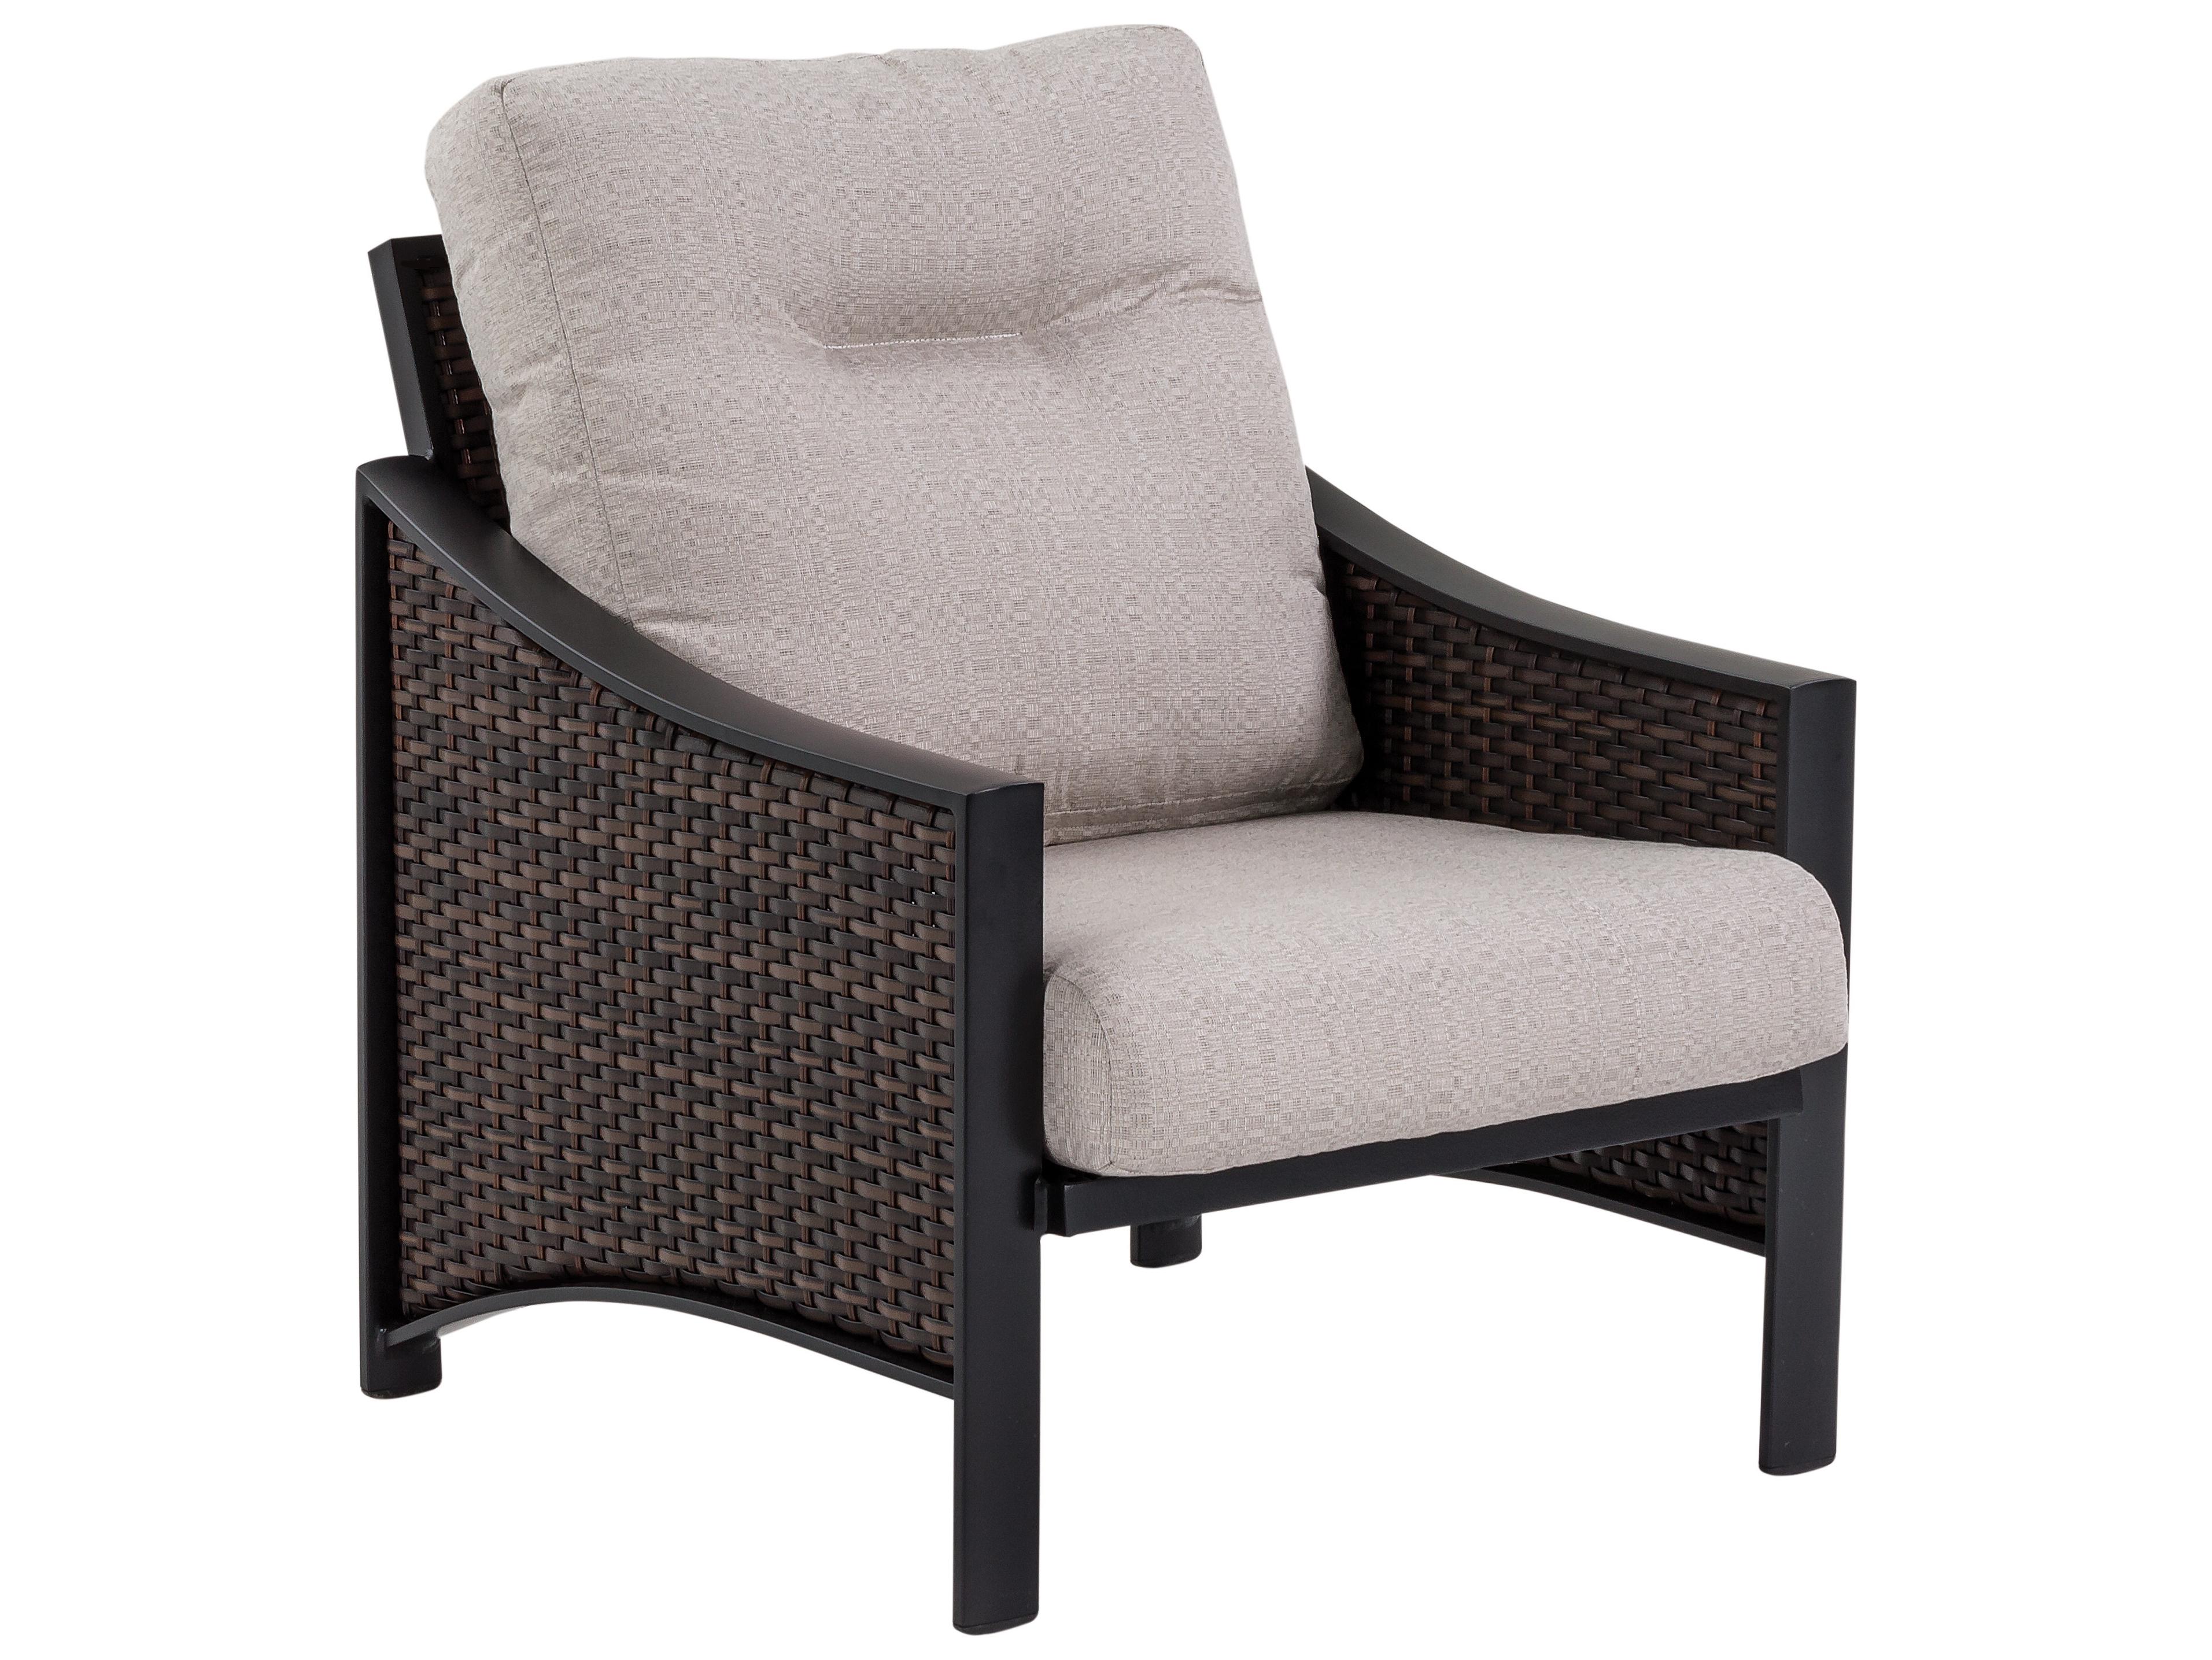 Tropitone Kenzo Woven Cushion Lounge Chair 391611ws